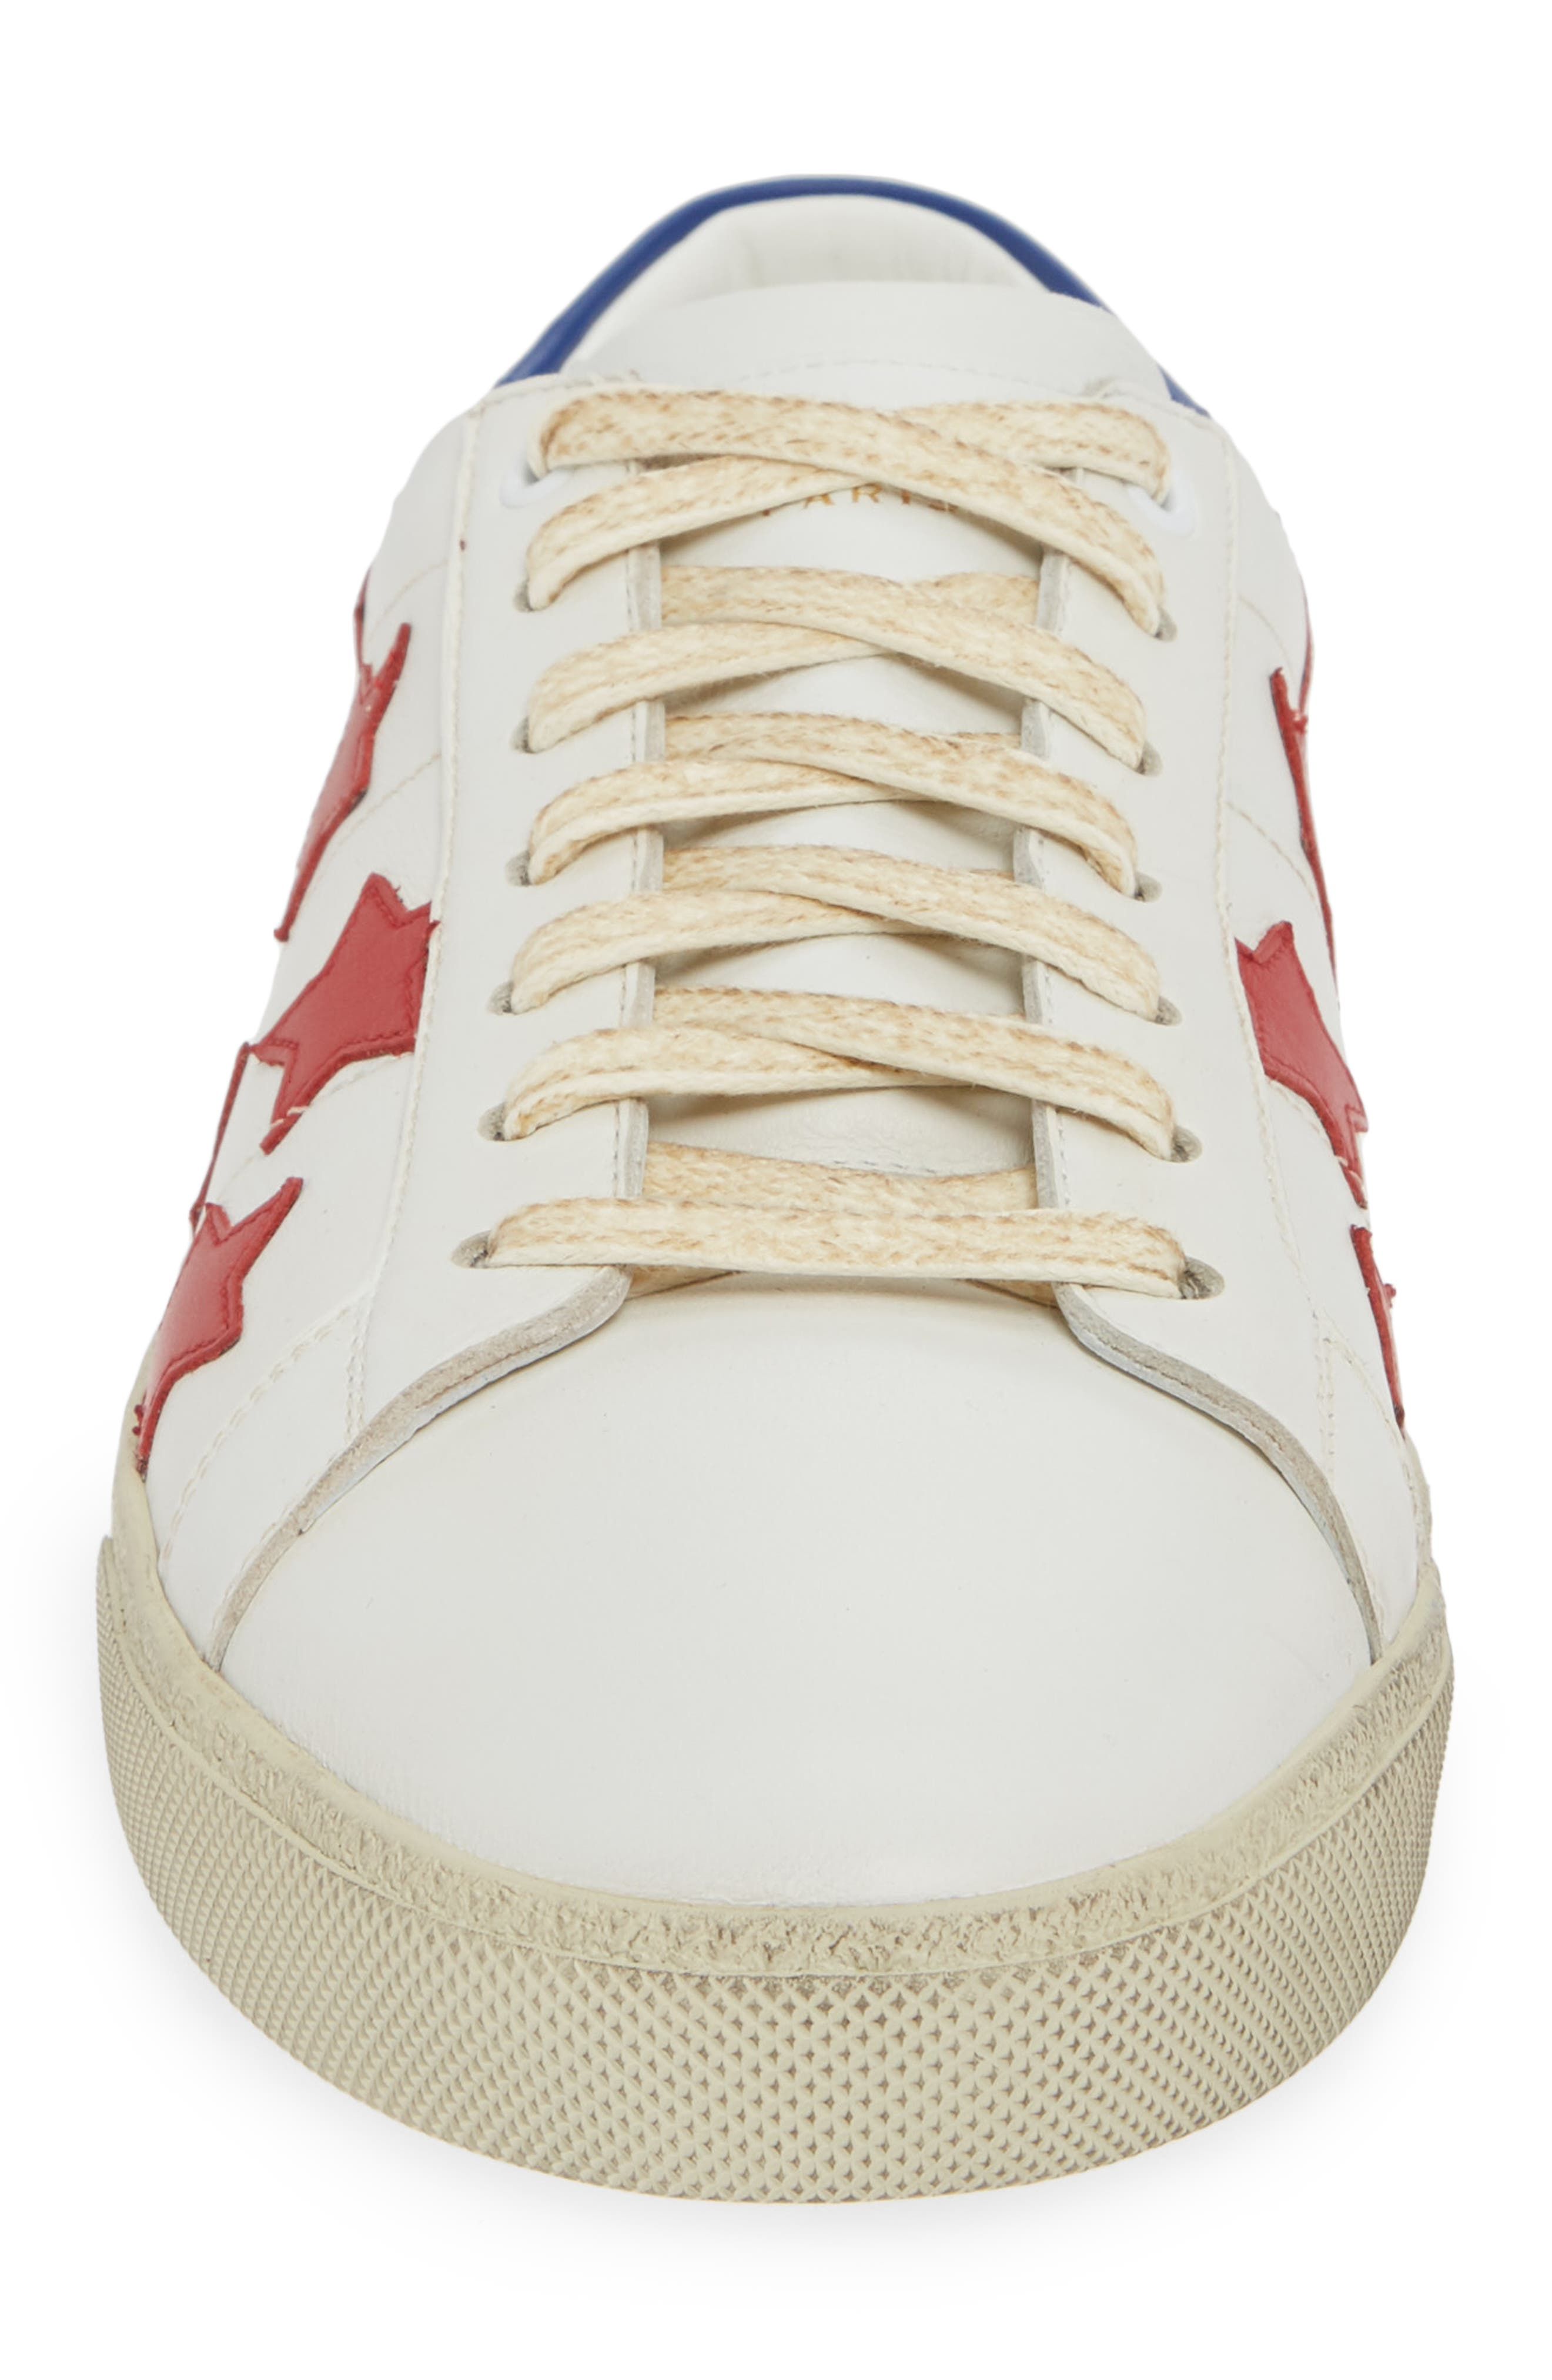 SAINT LAURENT,                             Star Low-Top Sneaker,                             Alternate thumbnail 4, color,                             WHITE/ MULTI